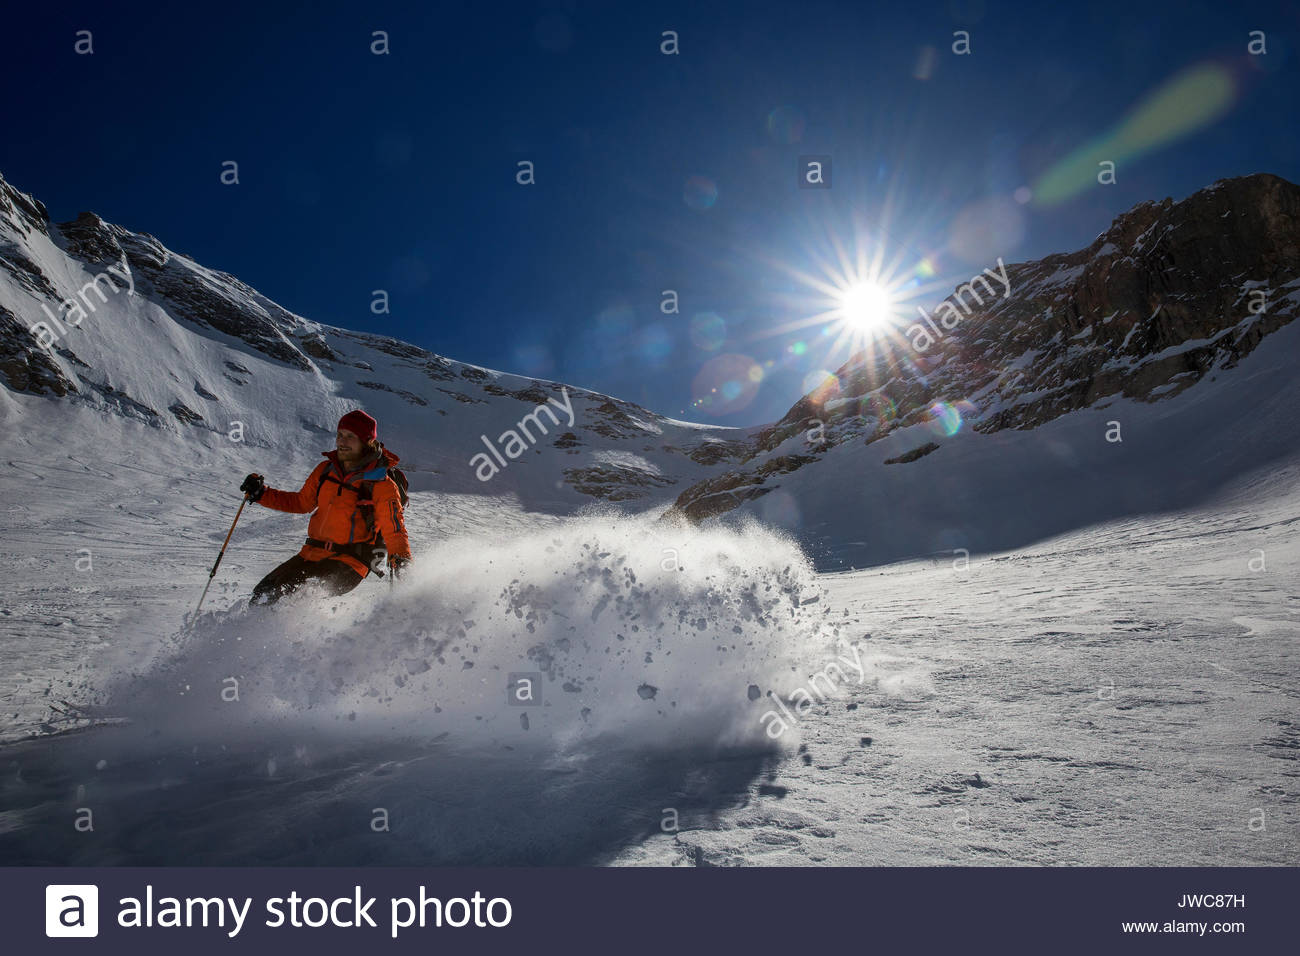 Skiing downhill near Marmolada. - Stock Image